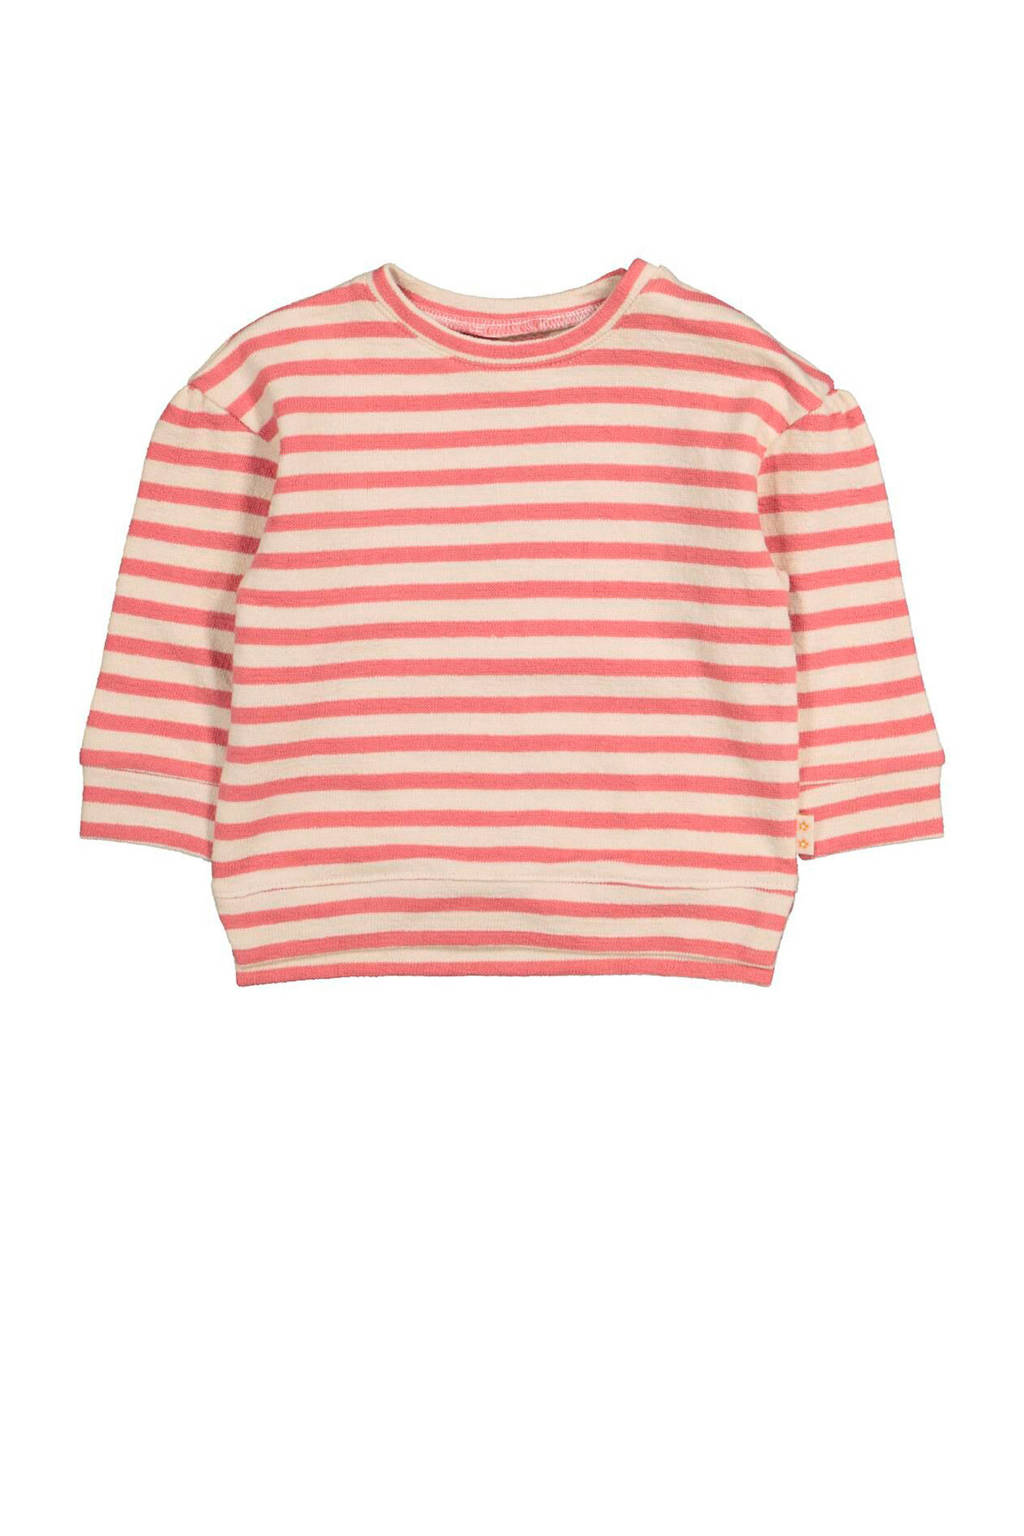 HEMA gestreepte sweater oudroze, Oudroze